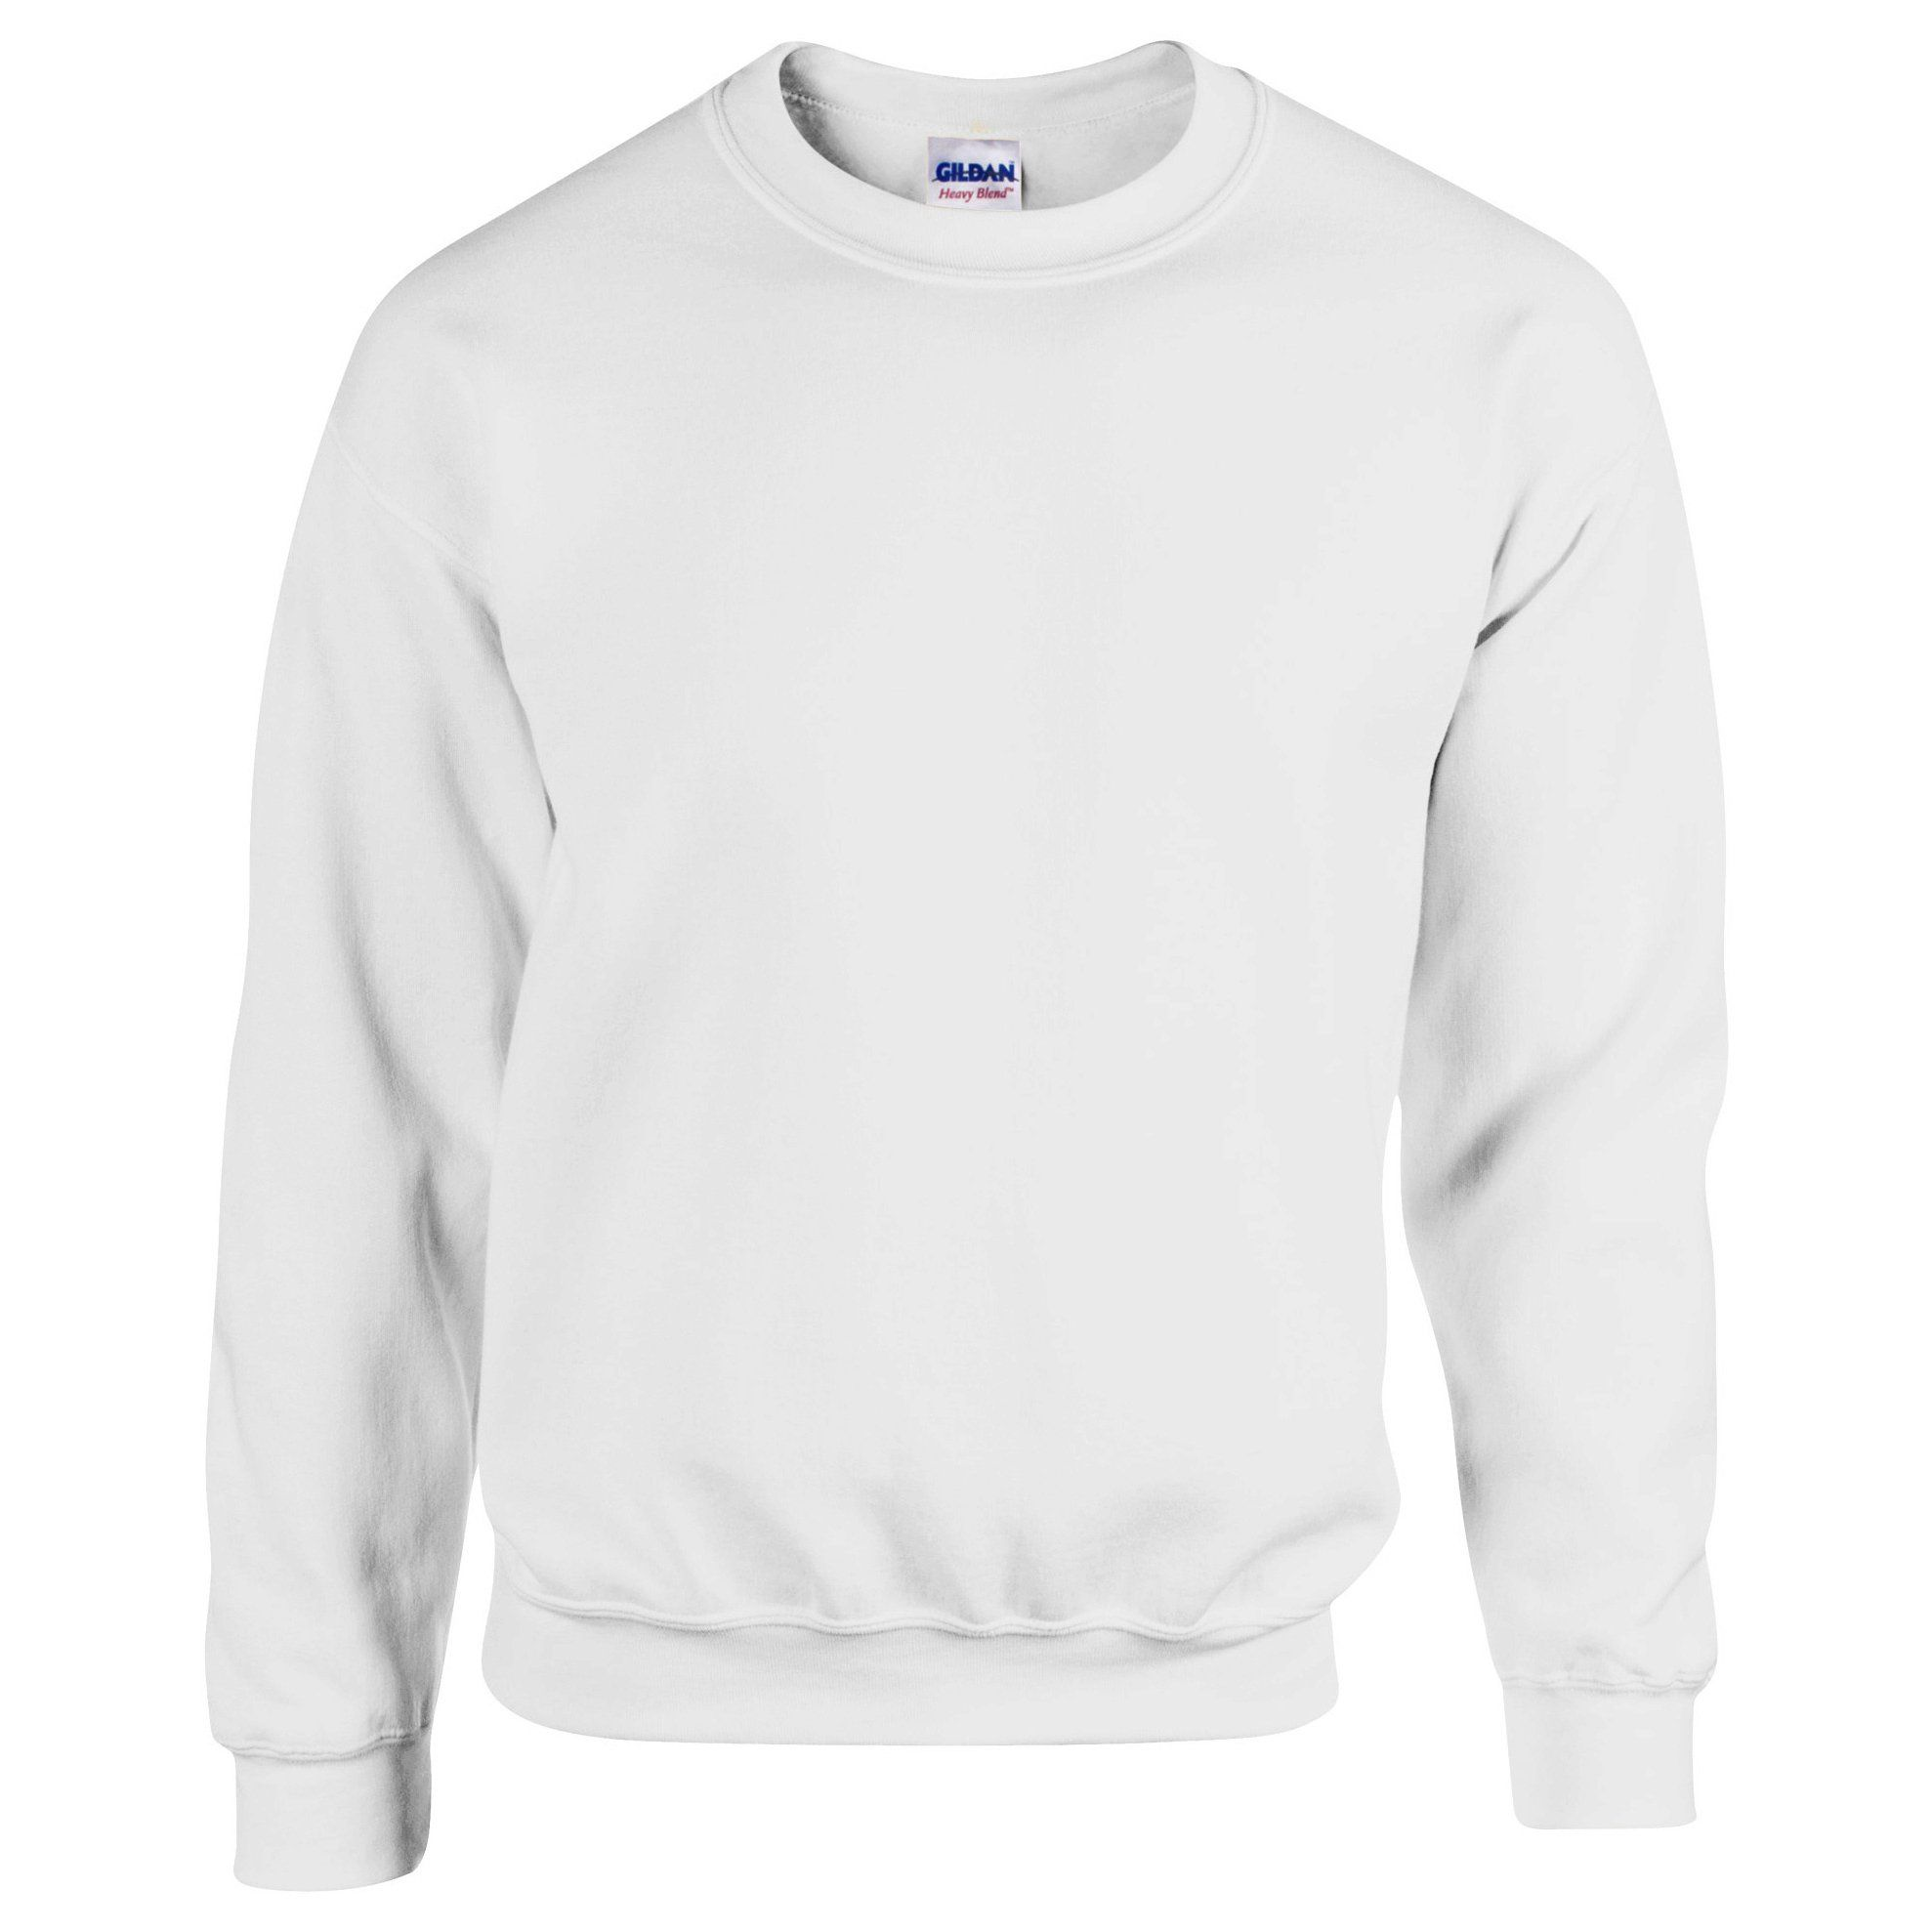 15257a774048 Gildan Long Sleeve T Shirts Amazon